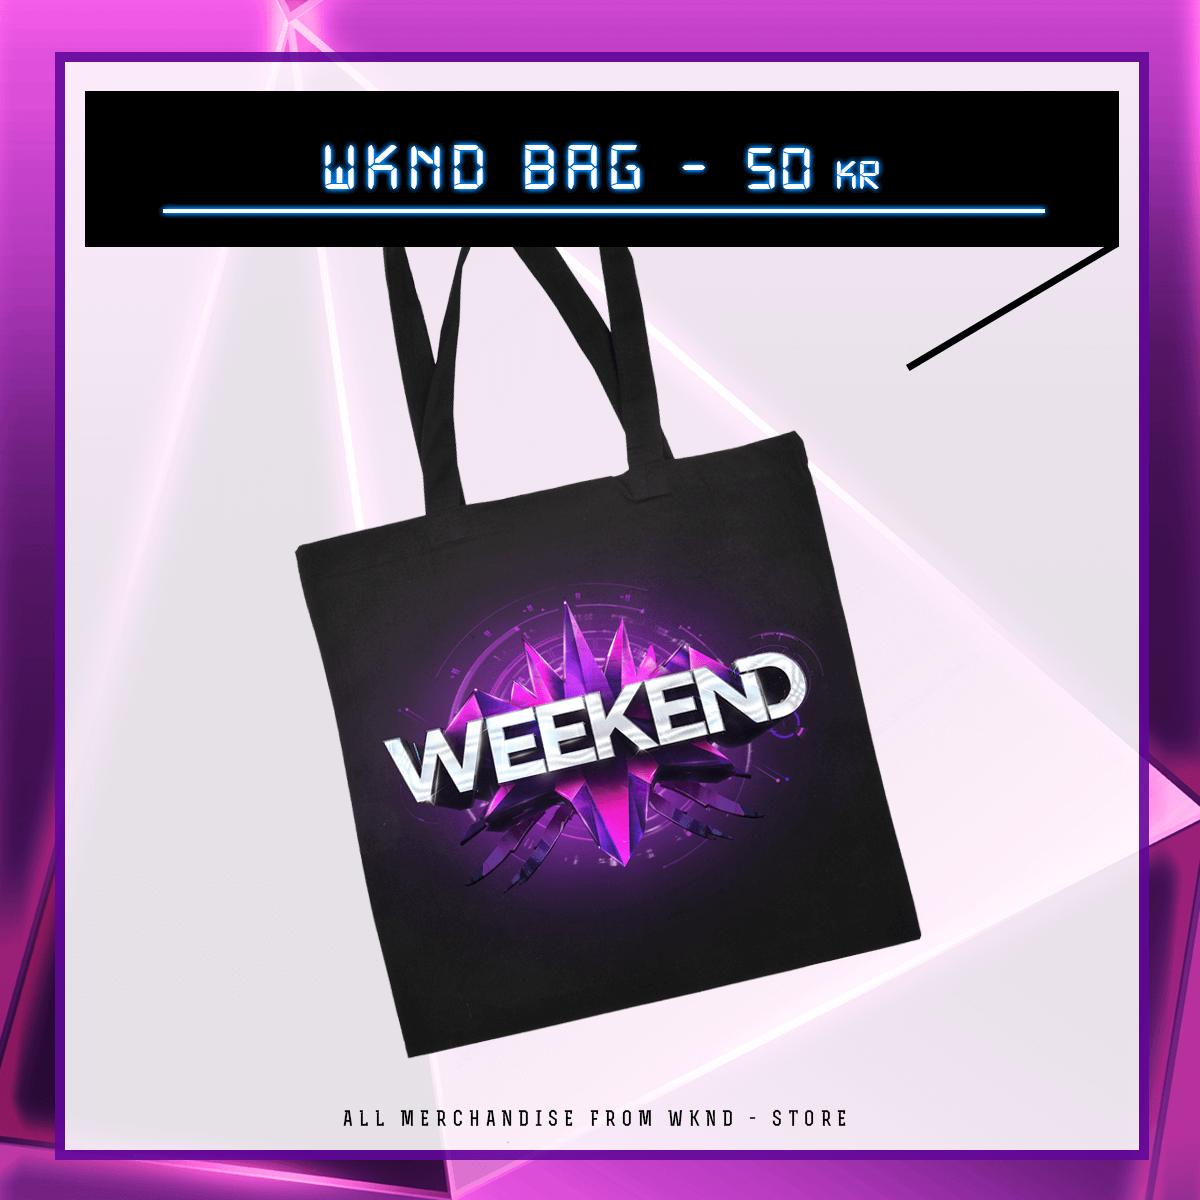 WKND-BAG-SWED